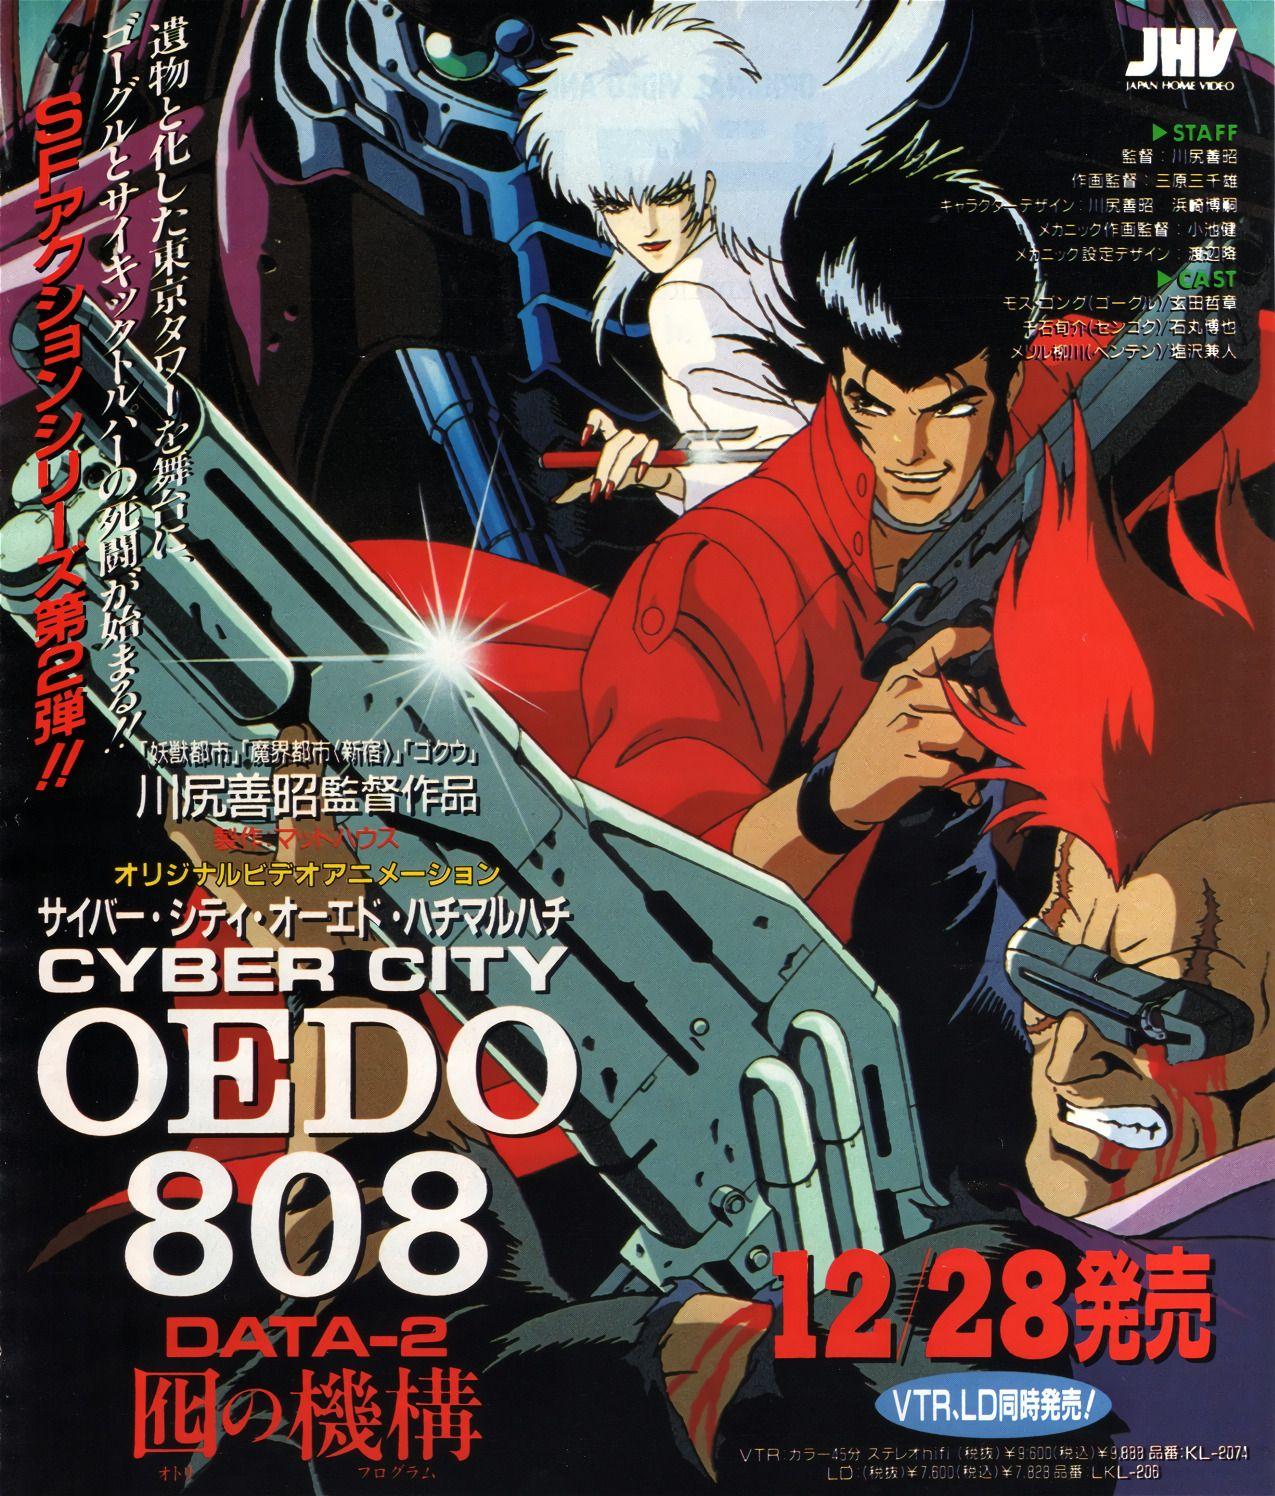 Animage 121990 cyber city oedo 808 anime cyber